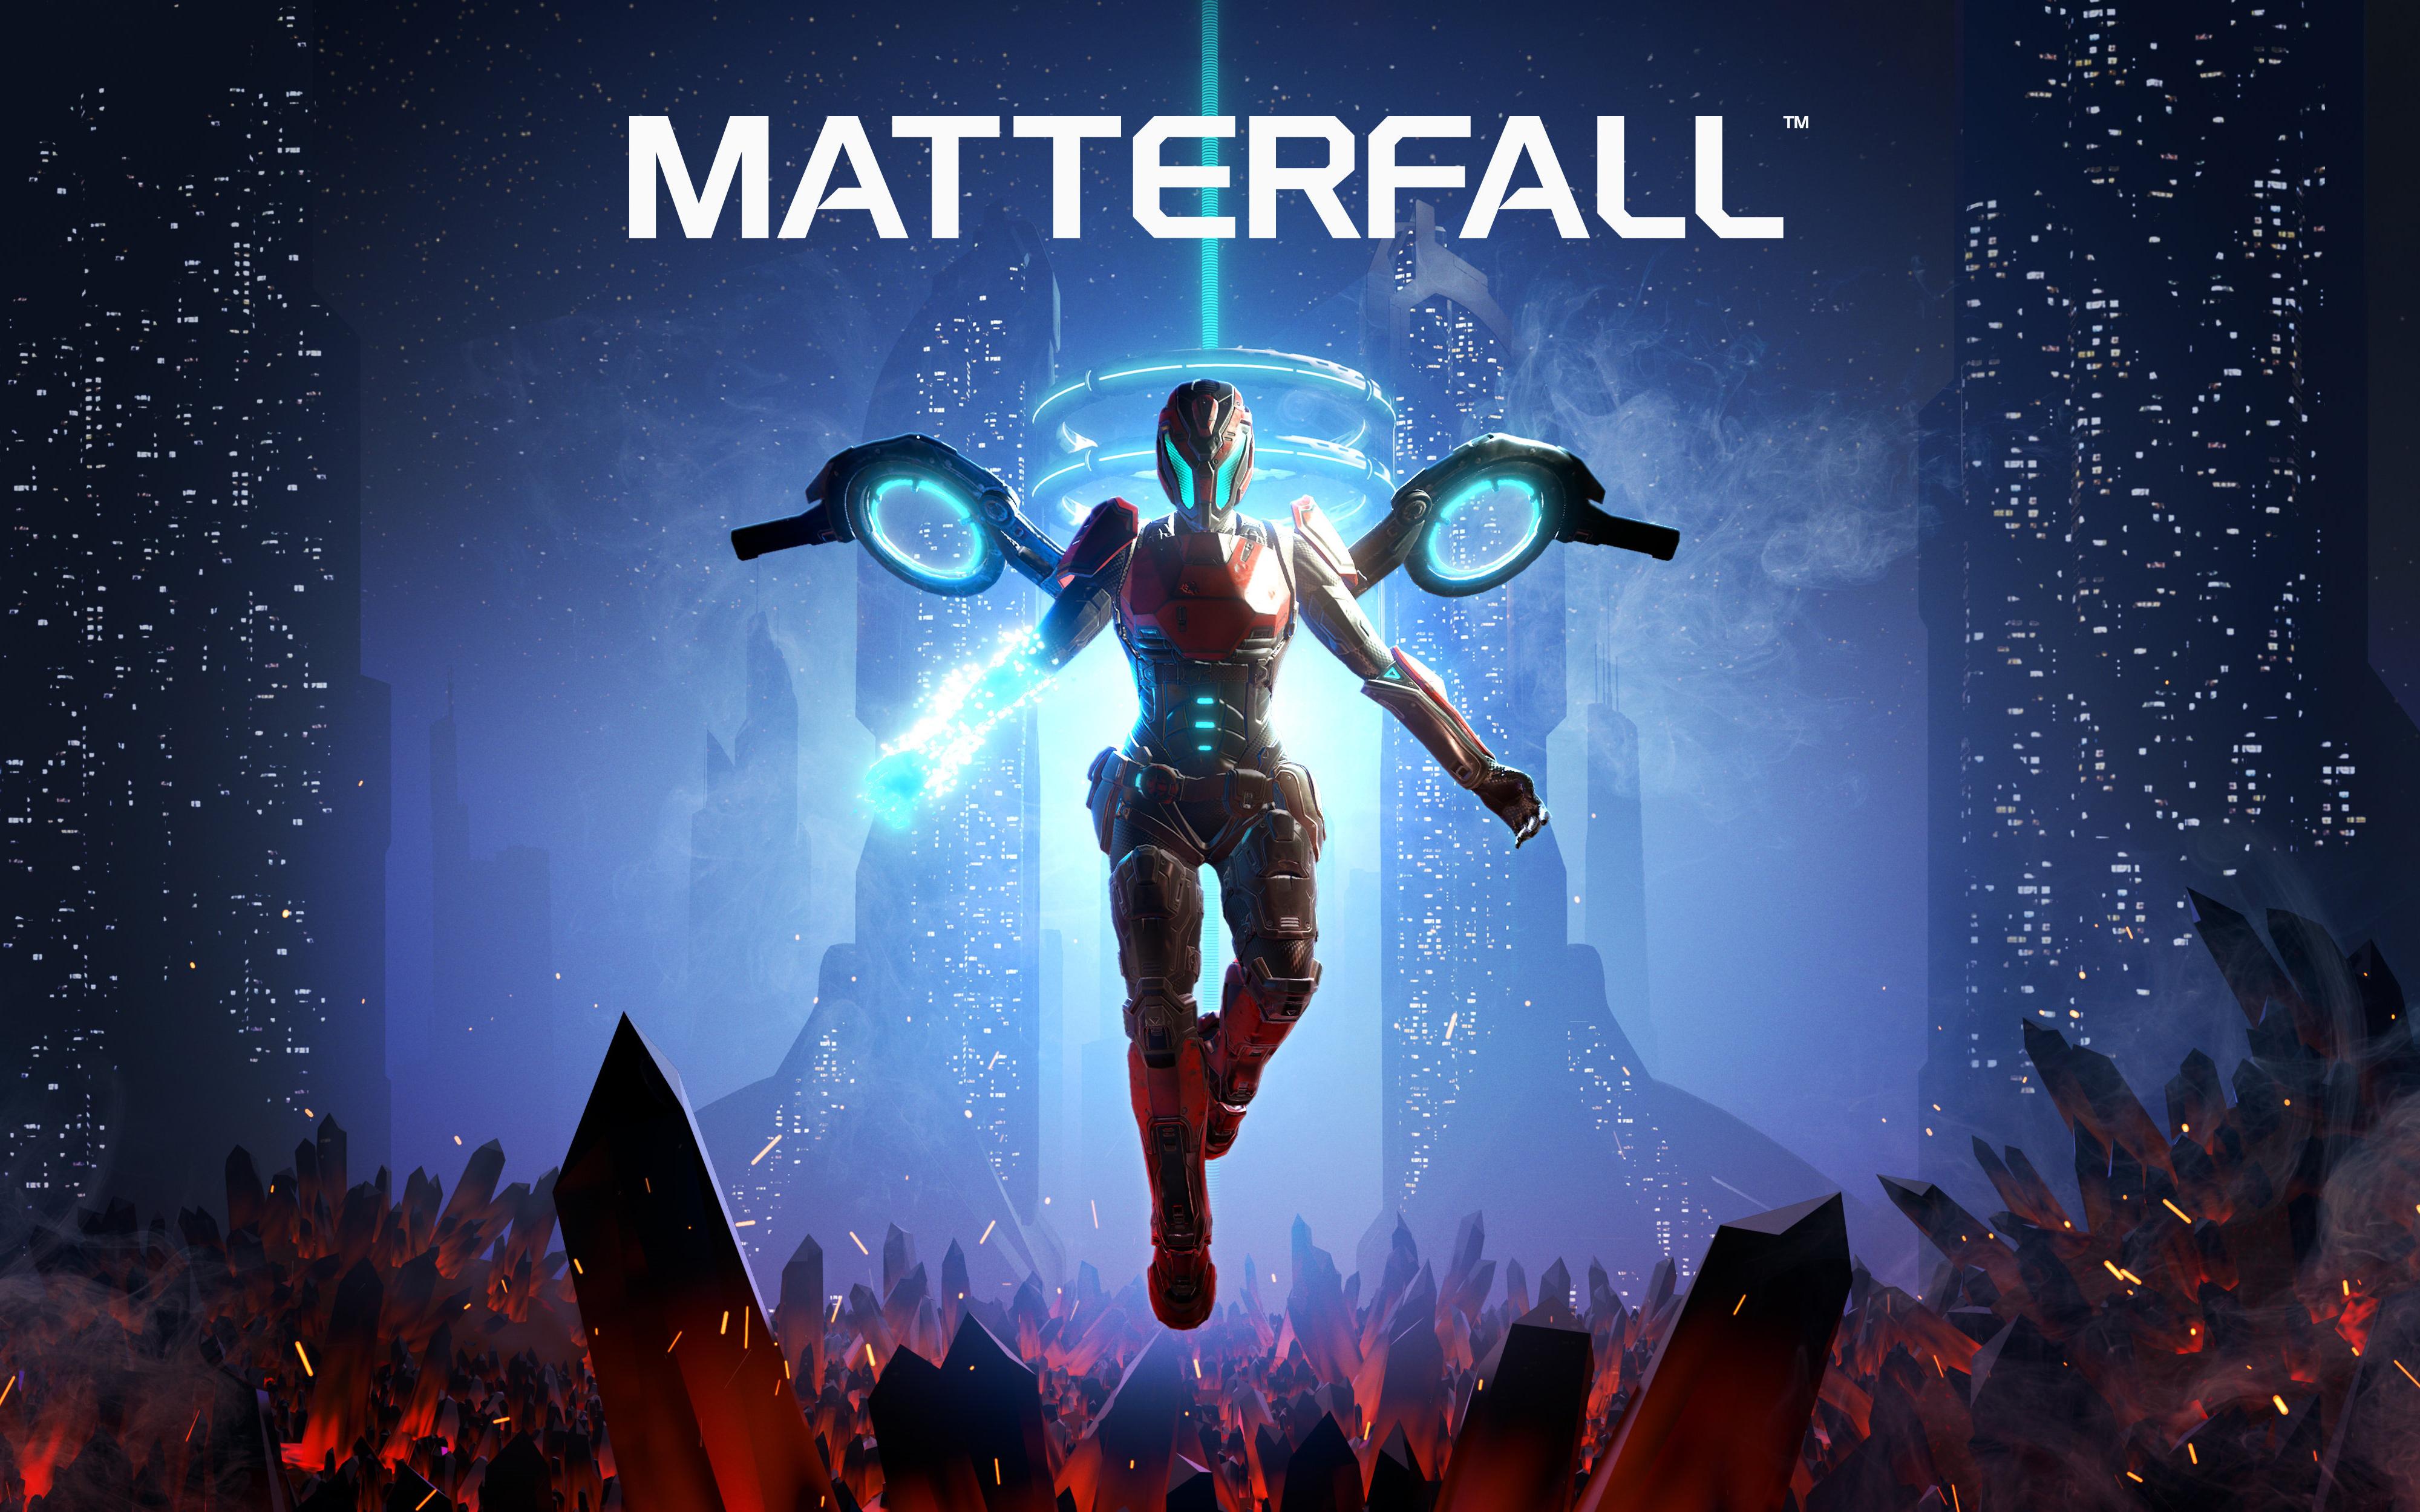 Matterfall игры ps4 обои скачать